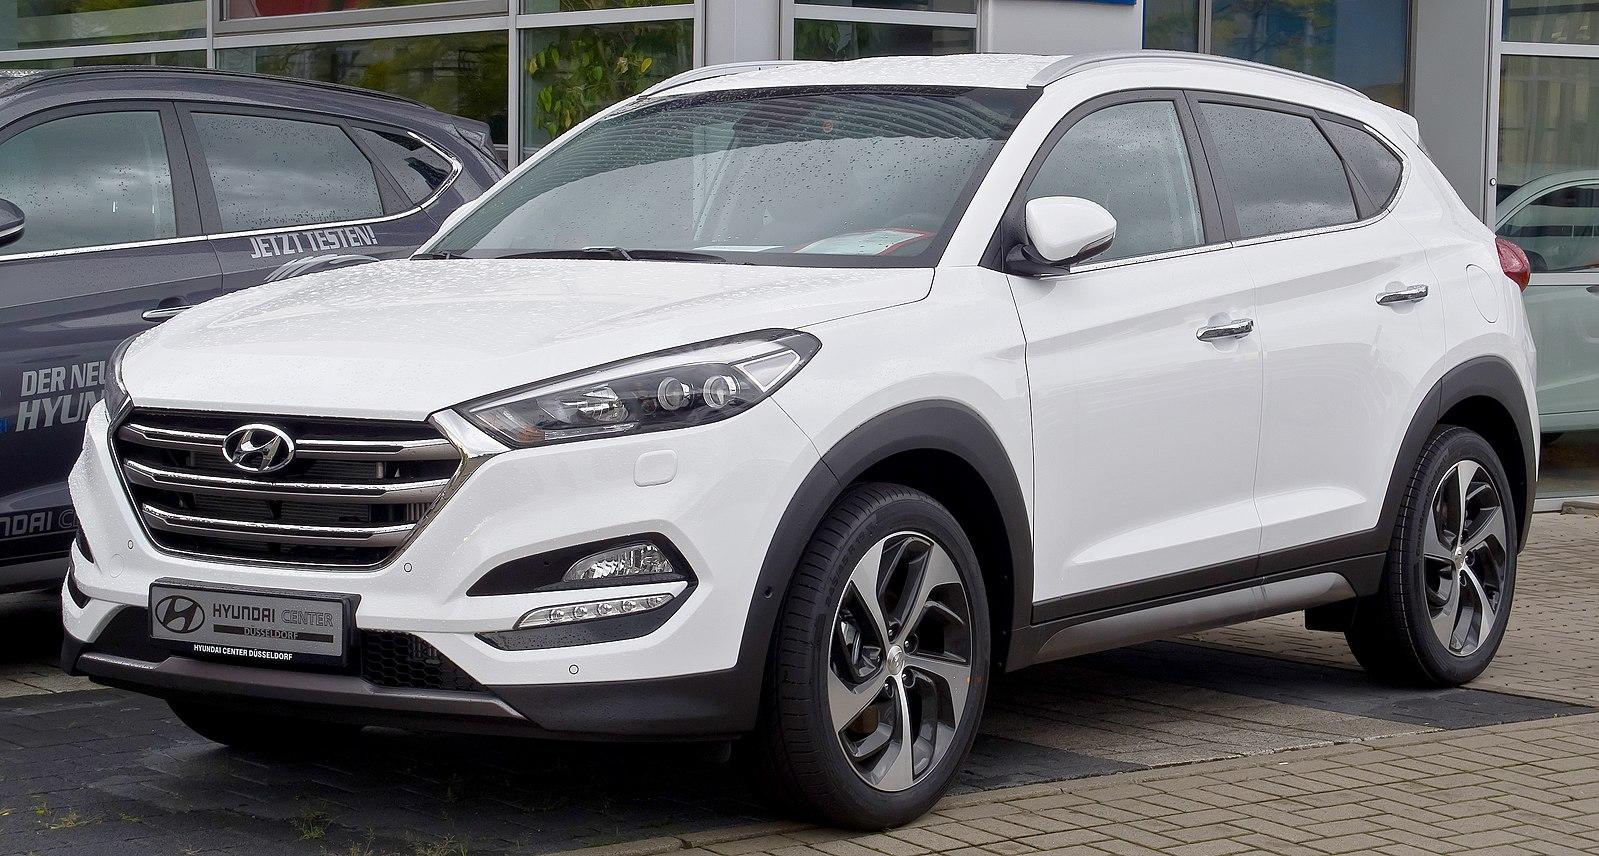 White Hyundai